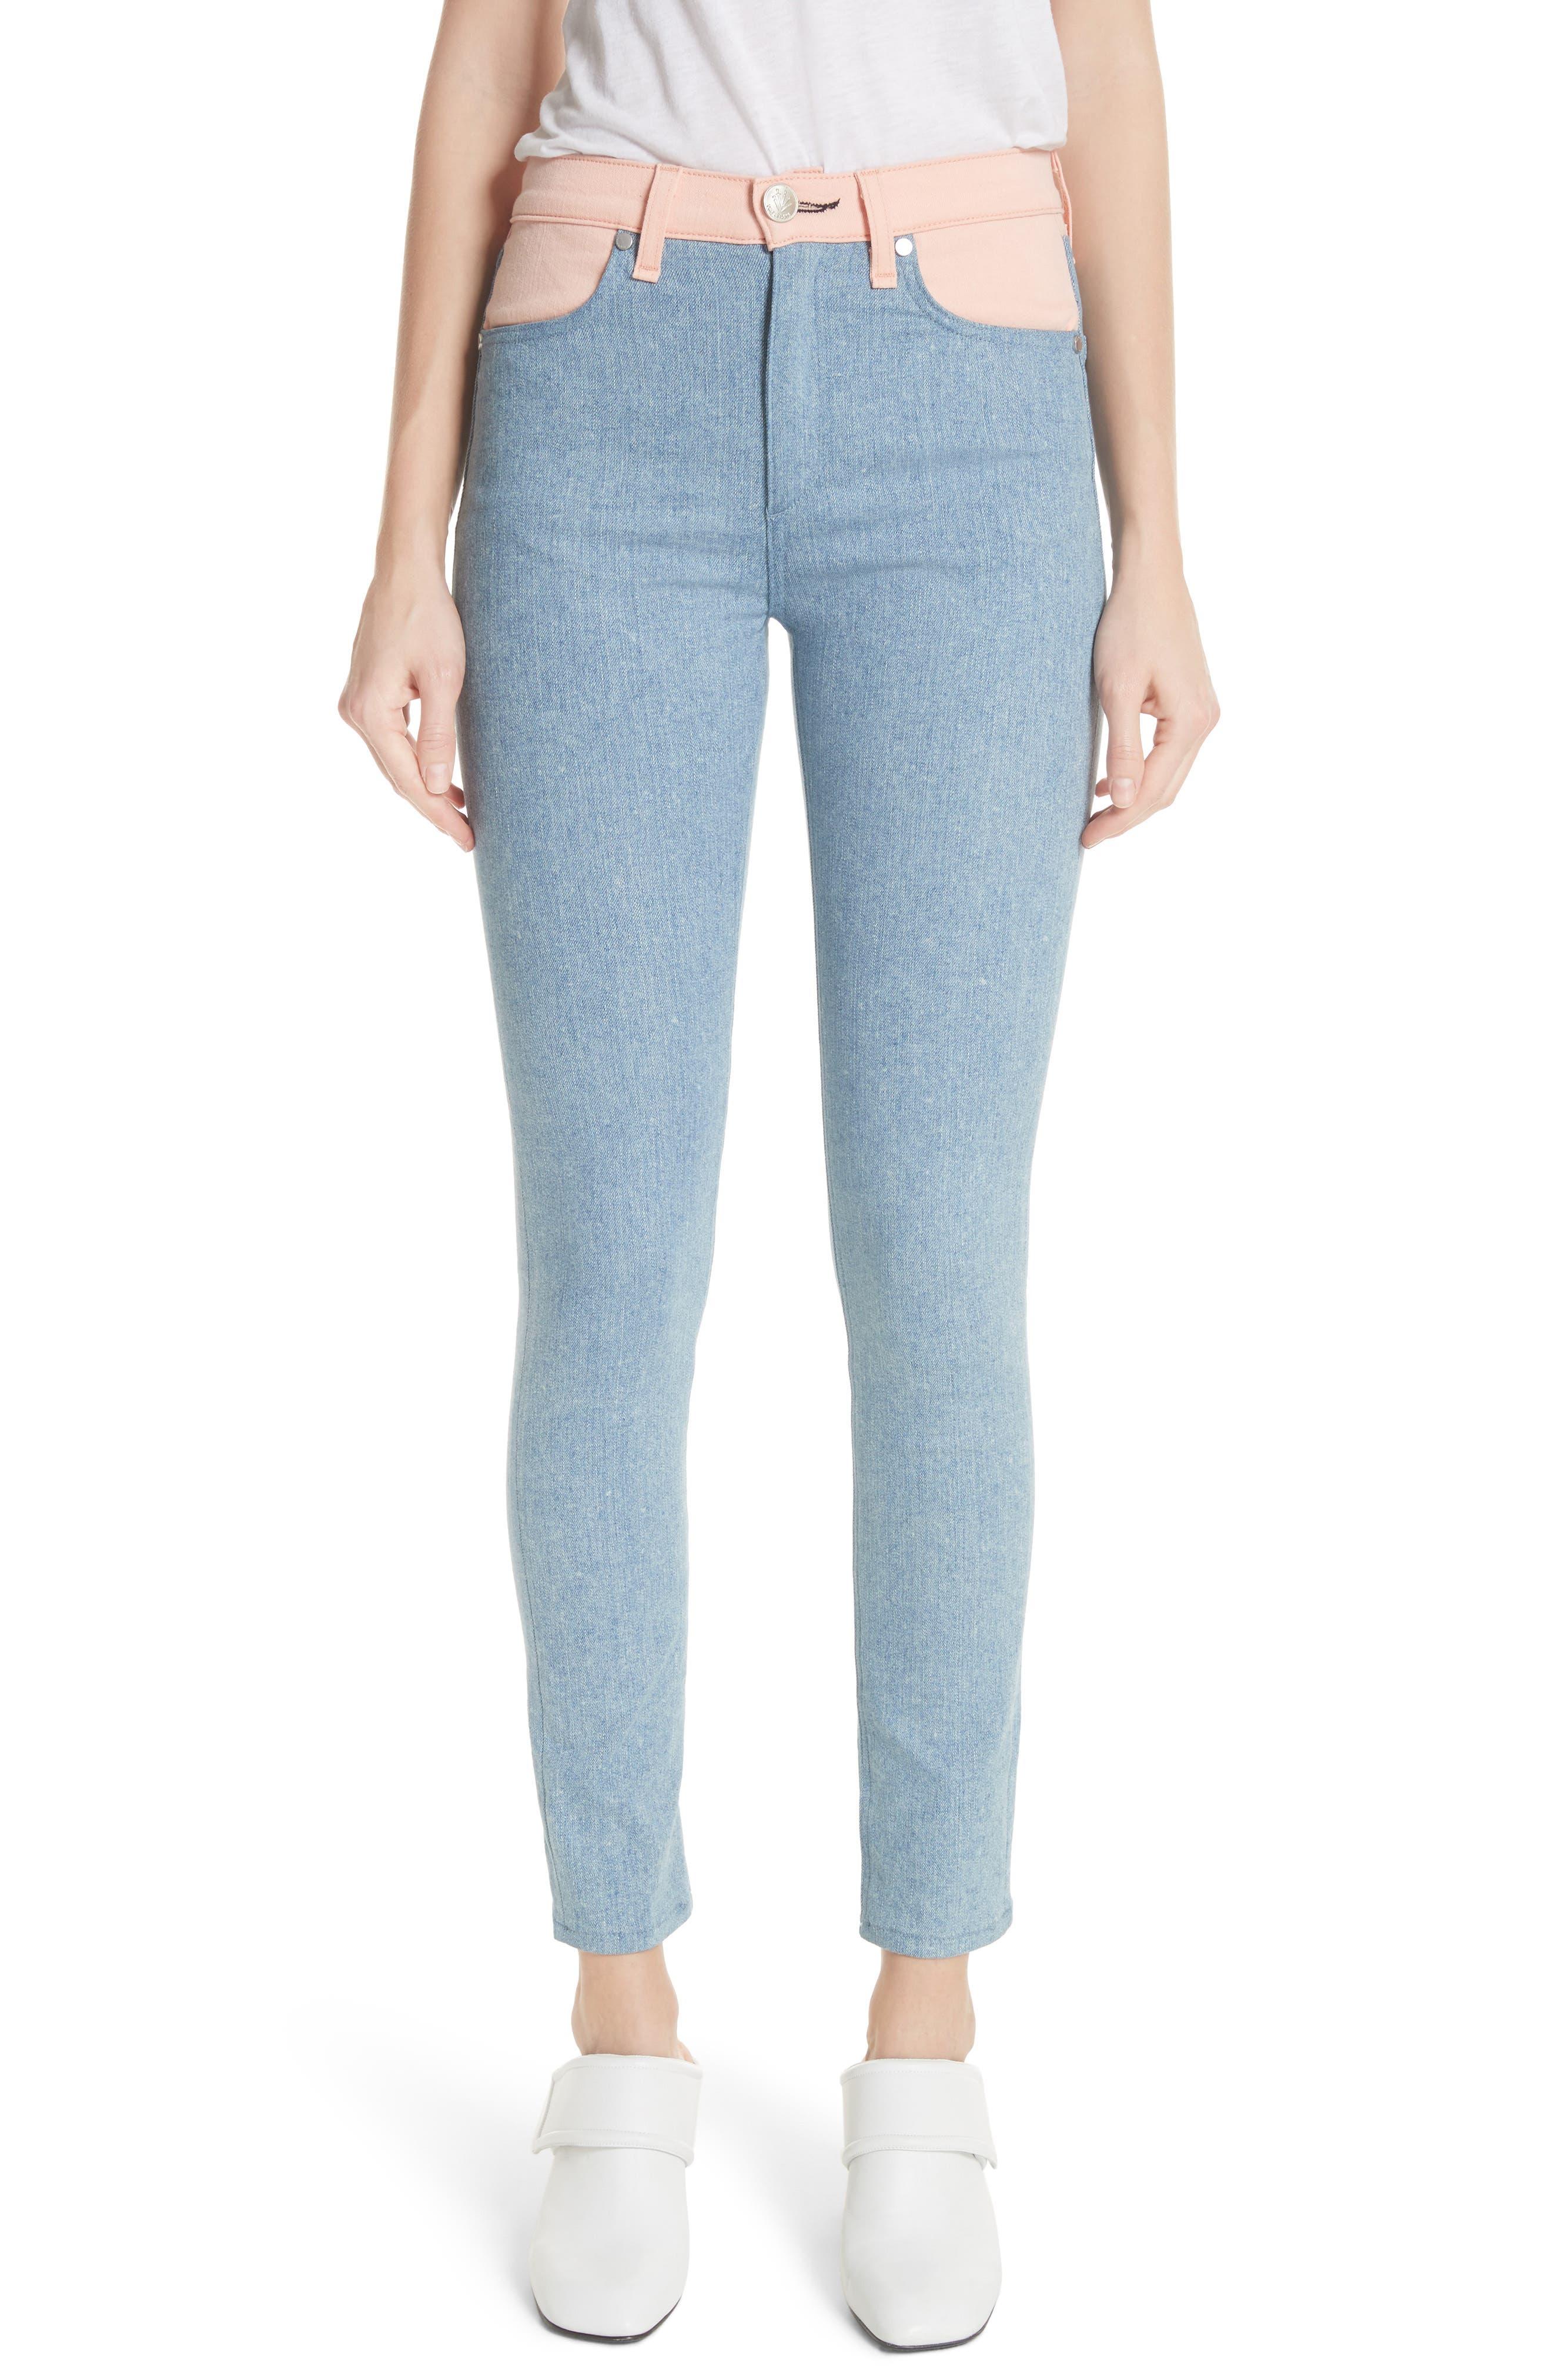 Phila Skinny Jeans,                         Main,                         color, Nelly/ Prairie